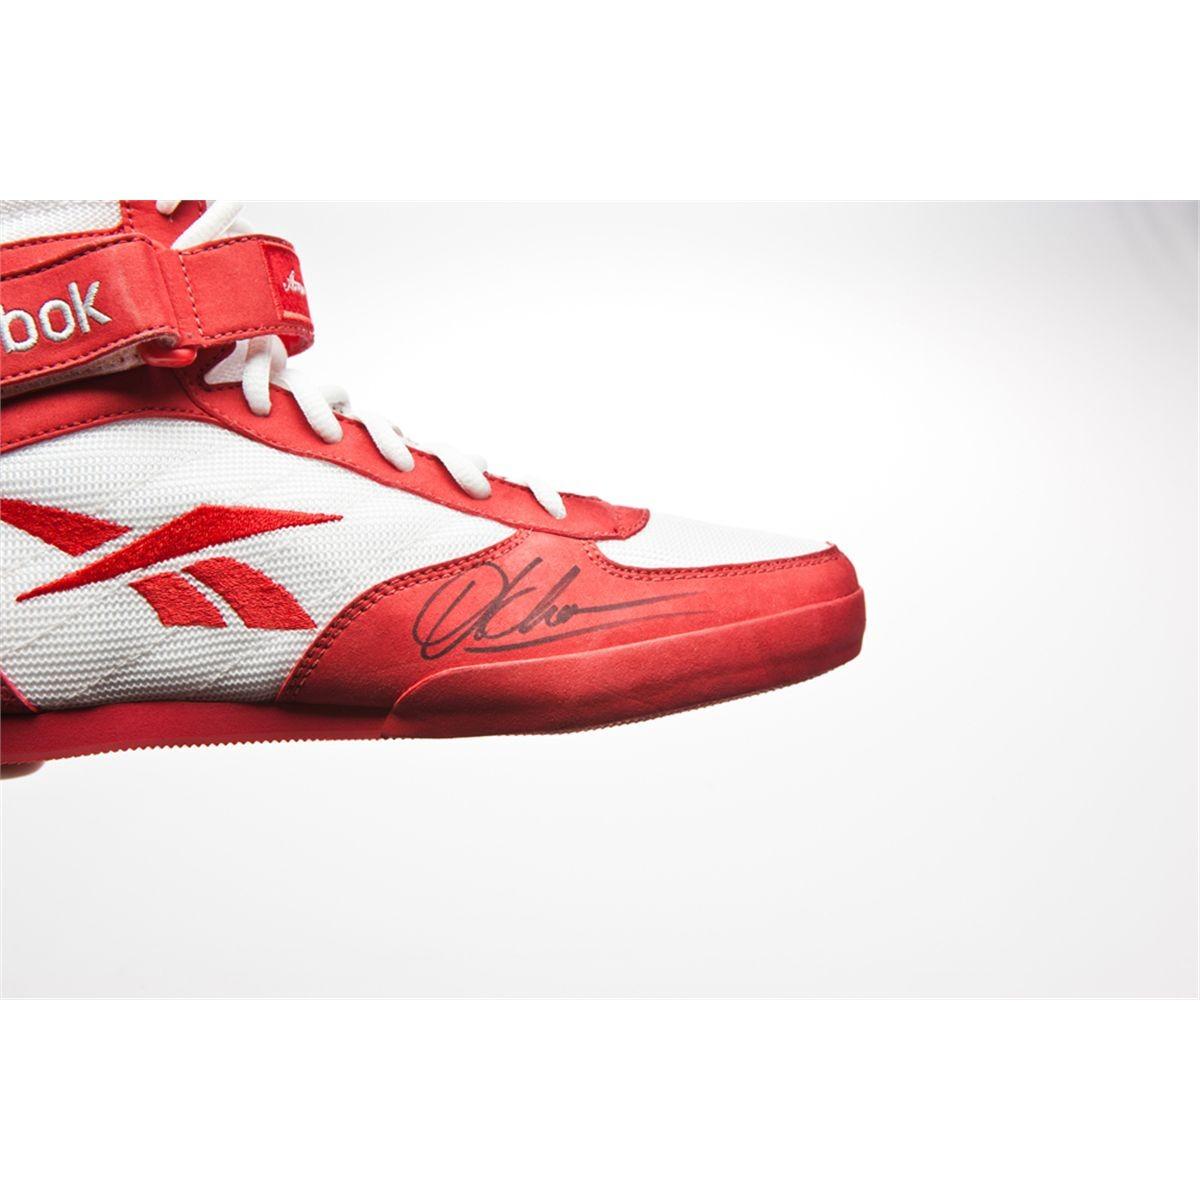 Mayweather Reebok Boxing Shoes